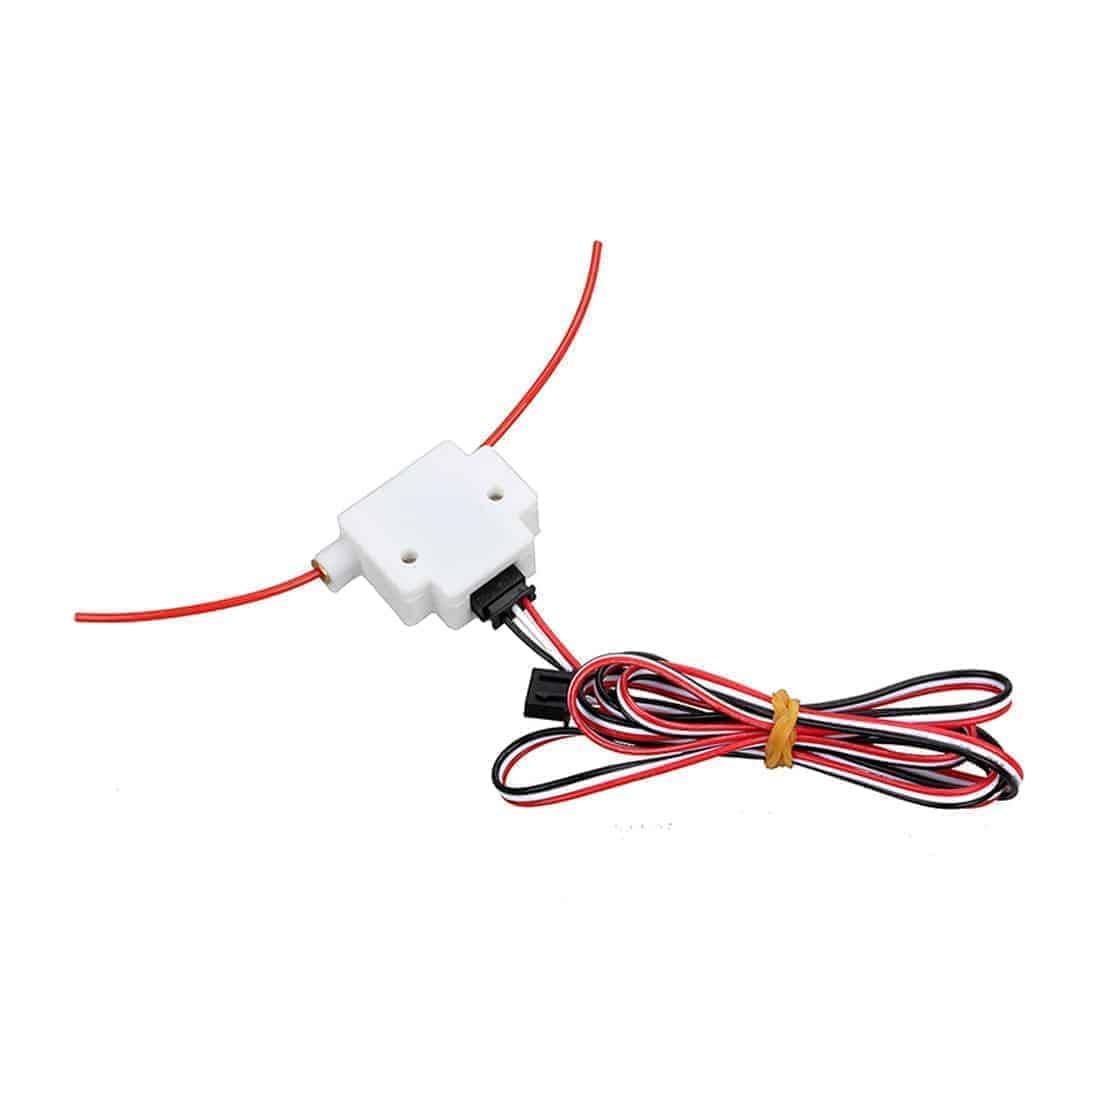 3d Printer Filament Break Detection Module Reprap Cr 10